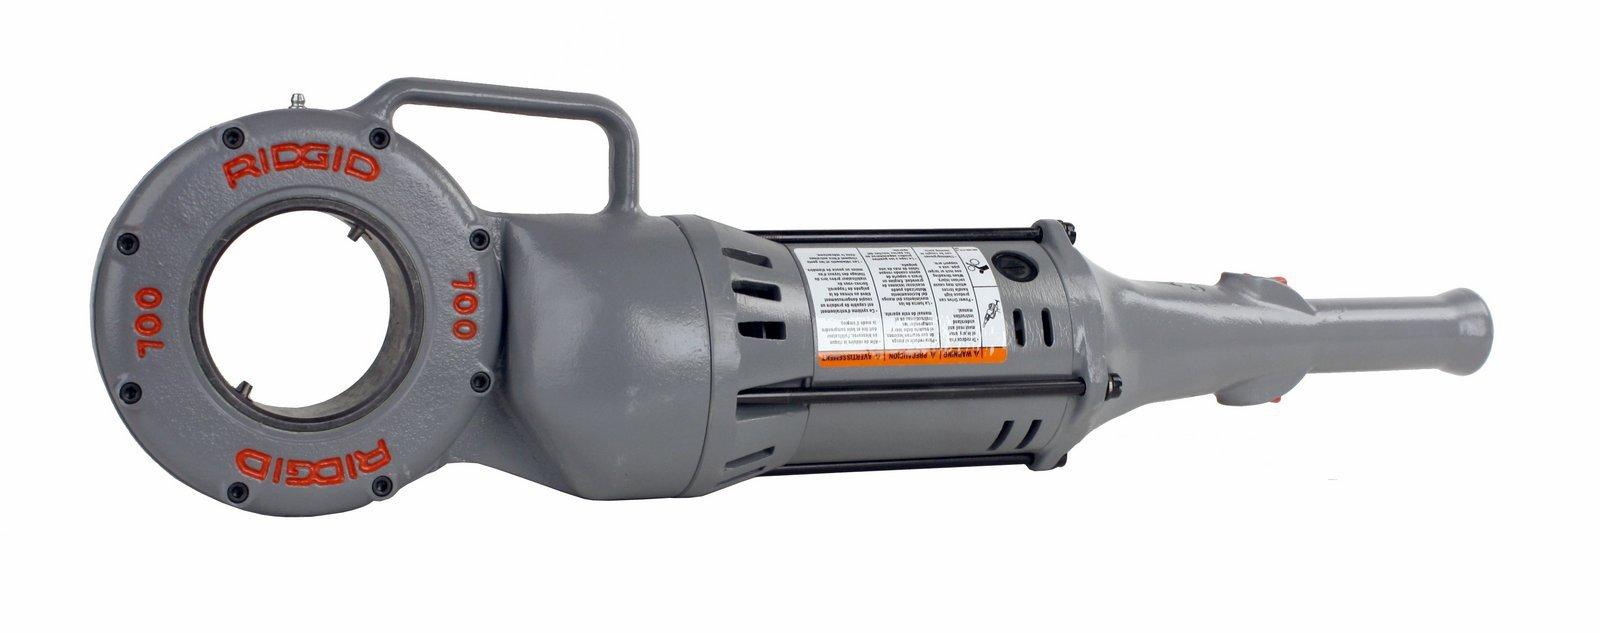 RIDGID 700 Power Drive 41935 Pipe Threader (Certified Refurbished) by Ridgid